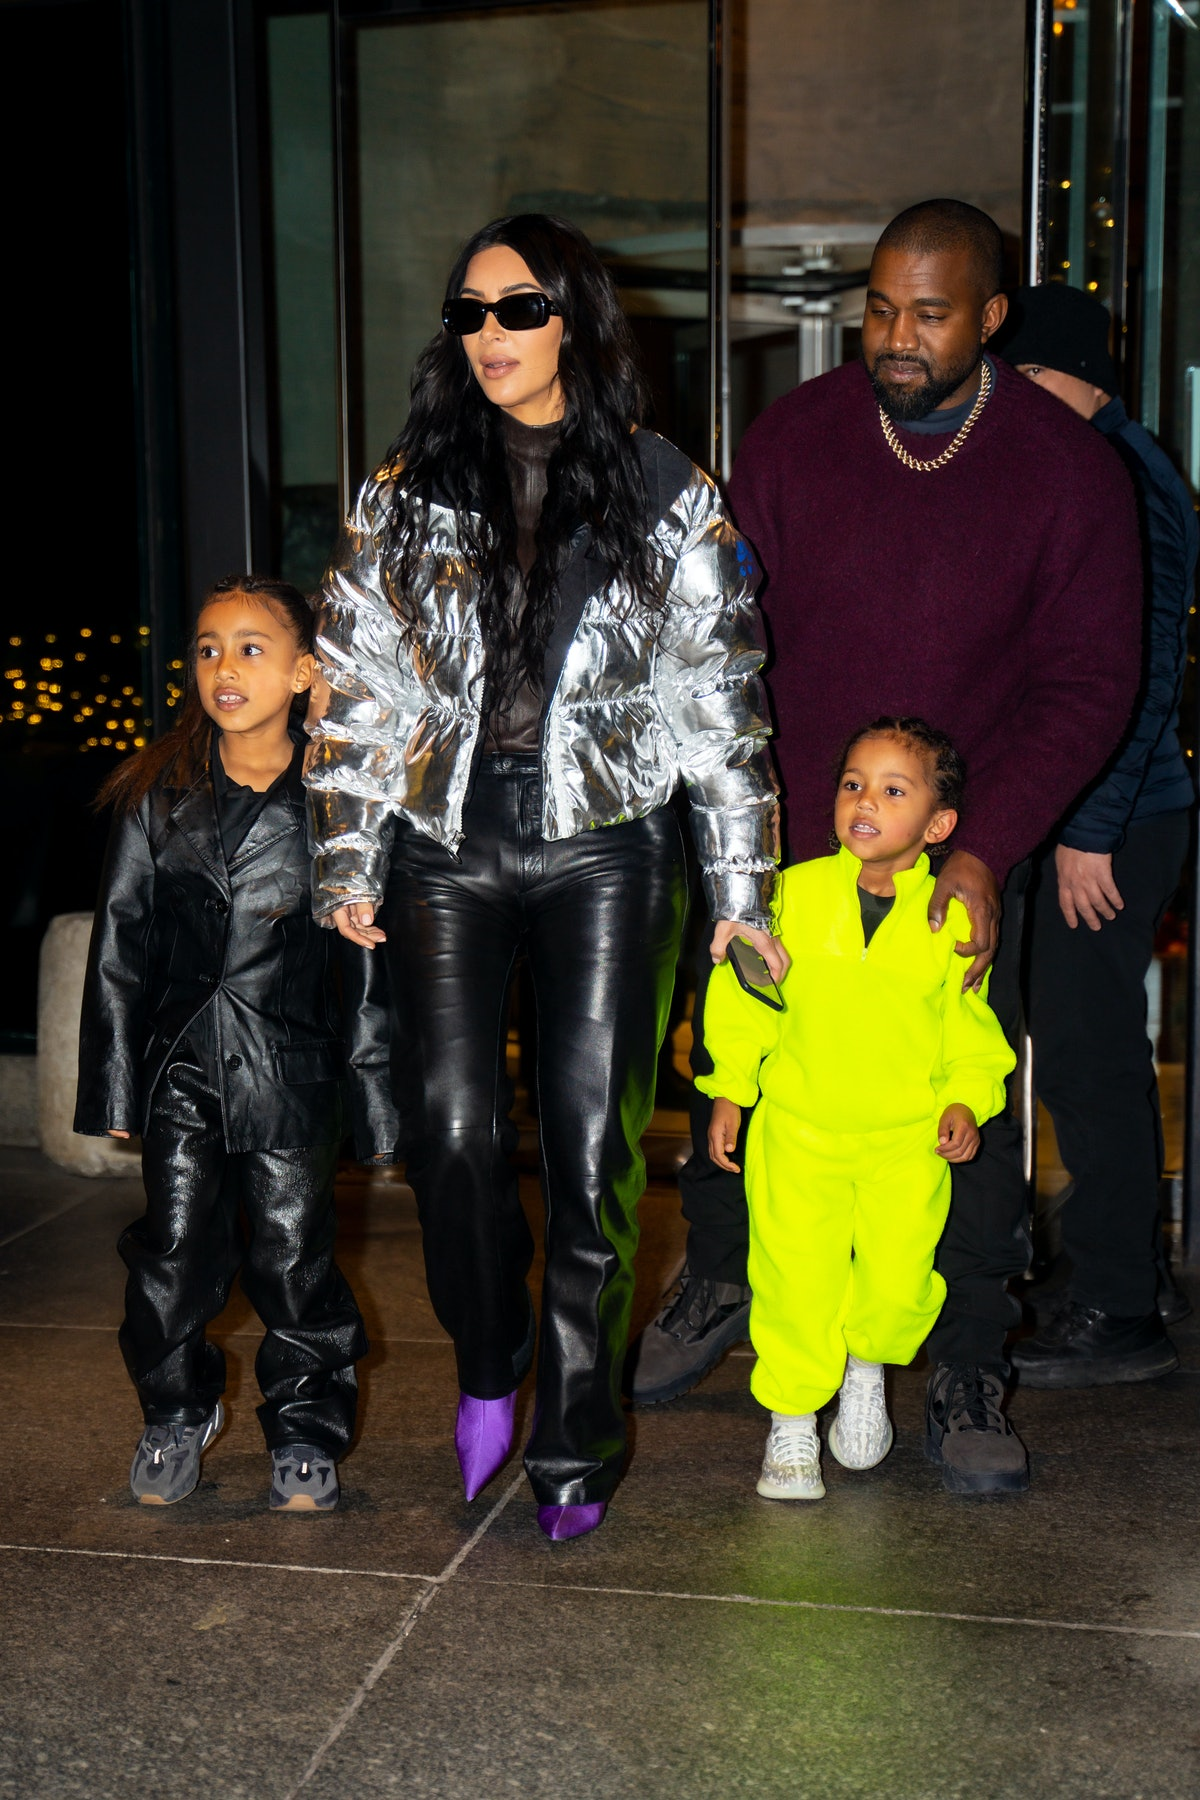 NEW YORK, NEW YORK - DECEMBER 21: (L-R) North West, Kim Kardashian, Kanye West and Saint West are se...